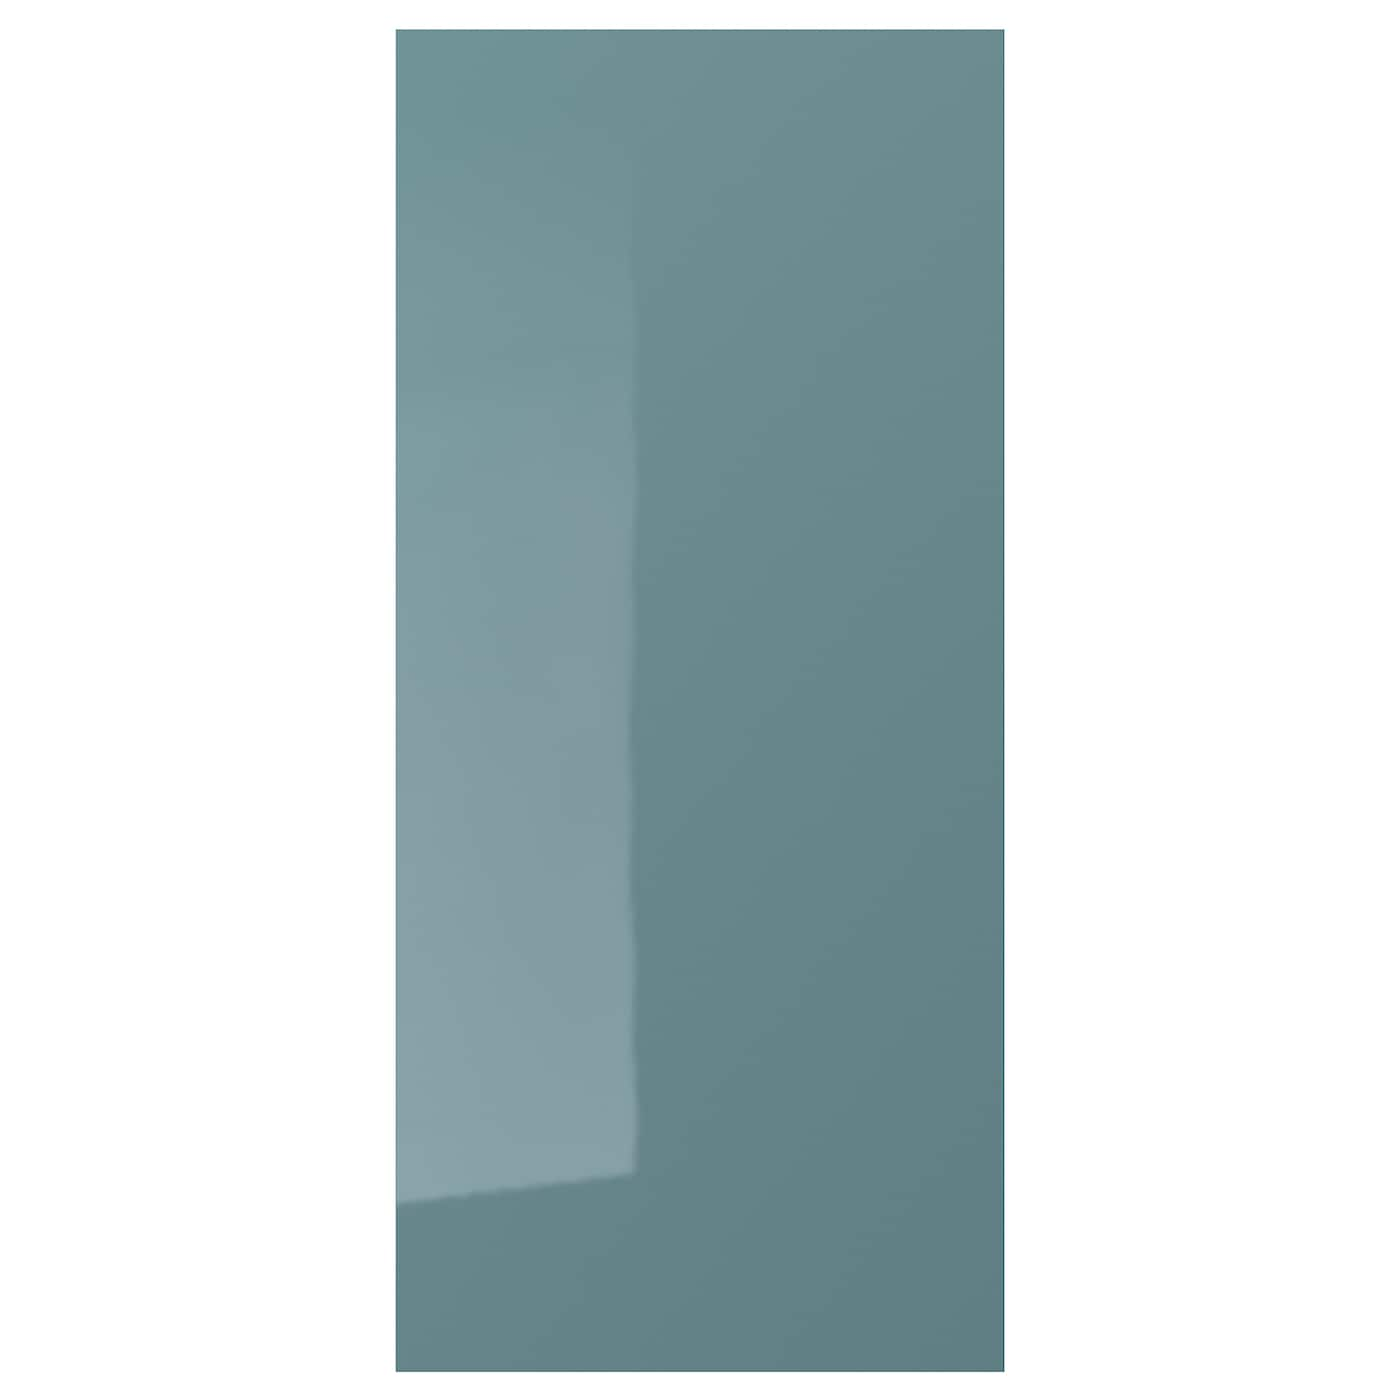 Ikea Cover Panels Decor Strips Ireland Dublin Fuse Box Ideas Kallarp